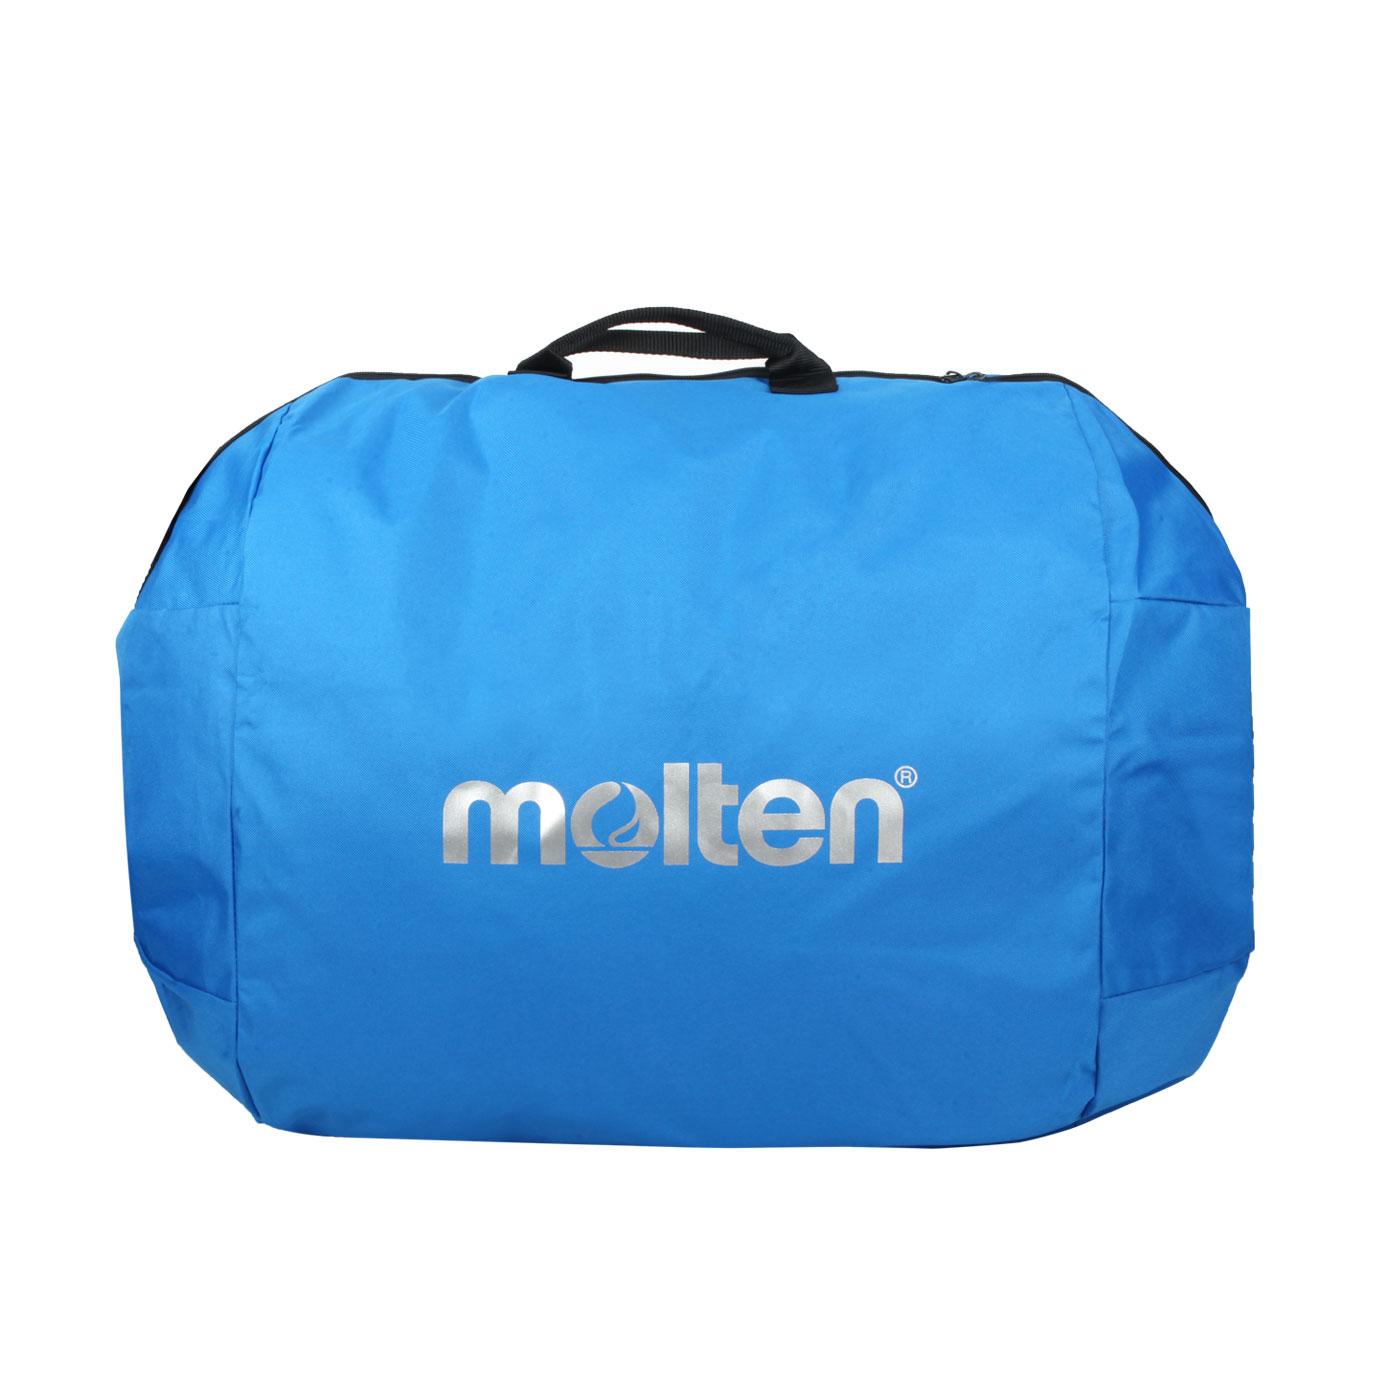 Molten 籃球袋六入裝 EB0046-B